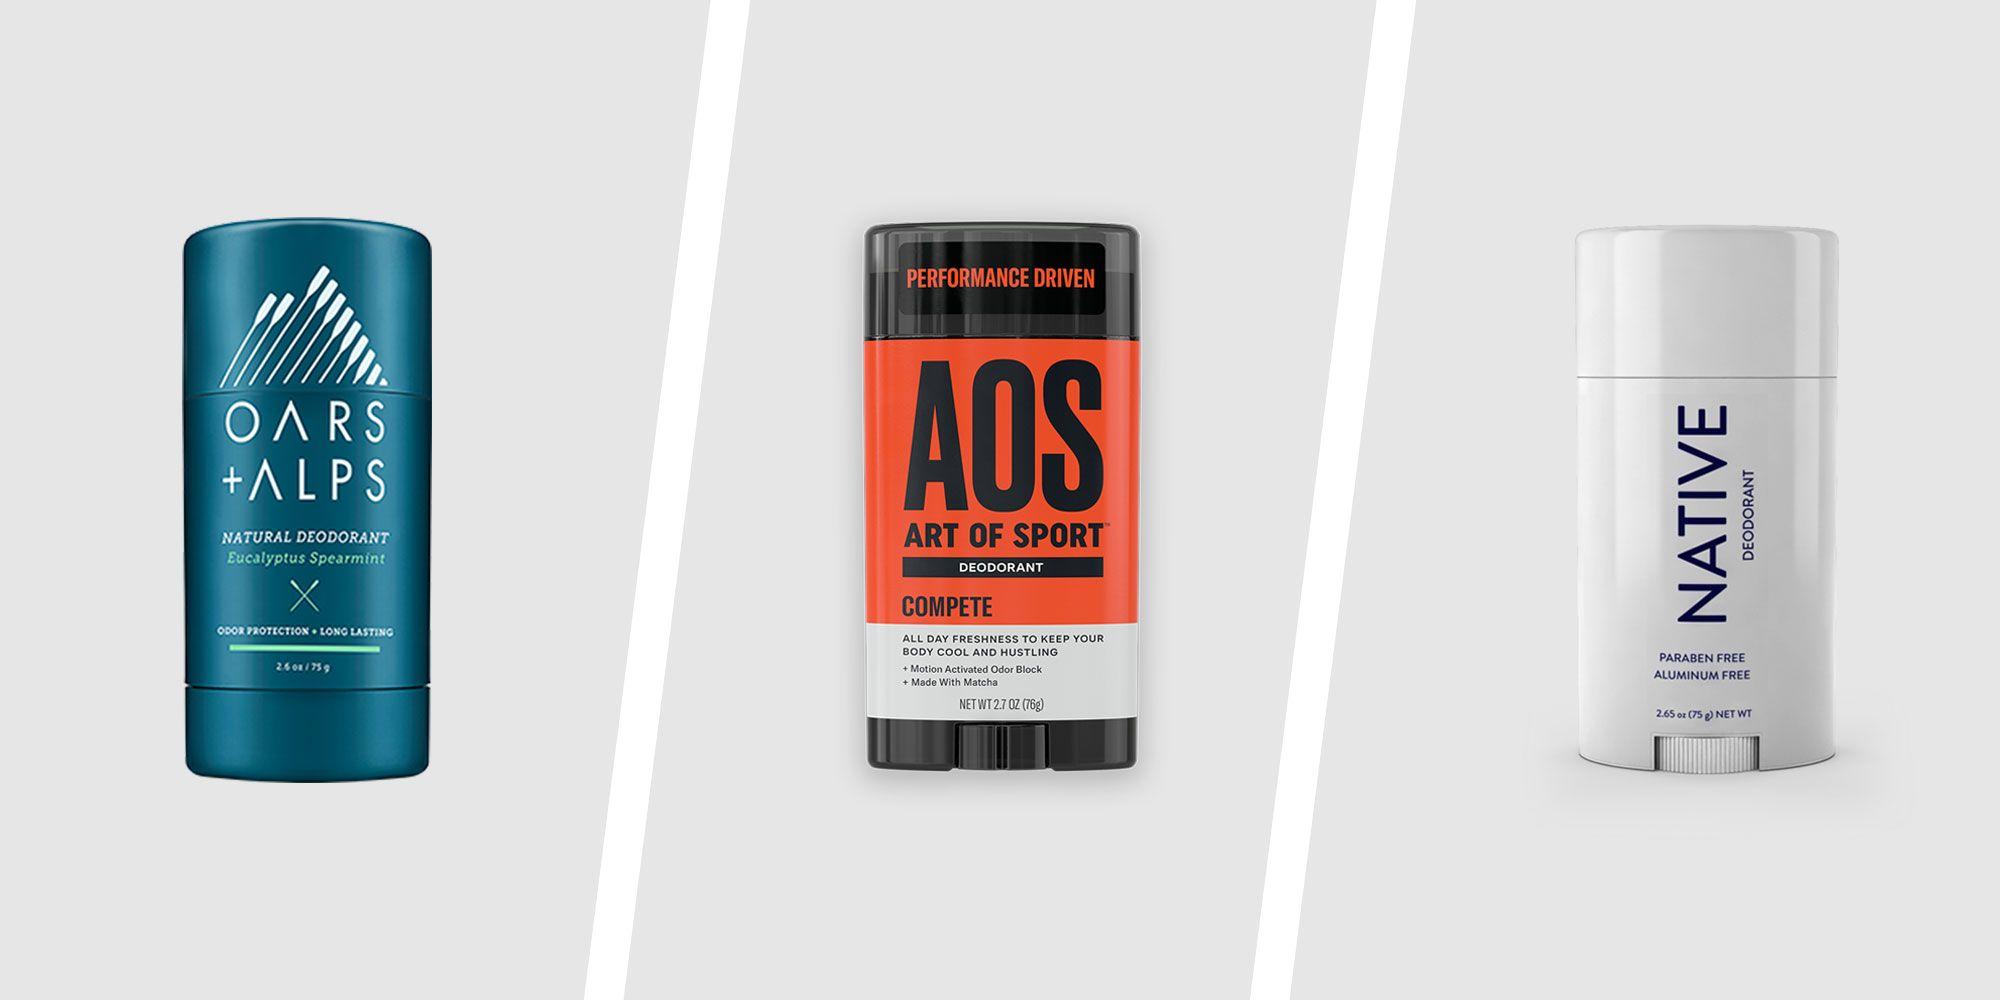 12 Best Deodorants For Men 2019 - Best Sprays and Sticks